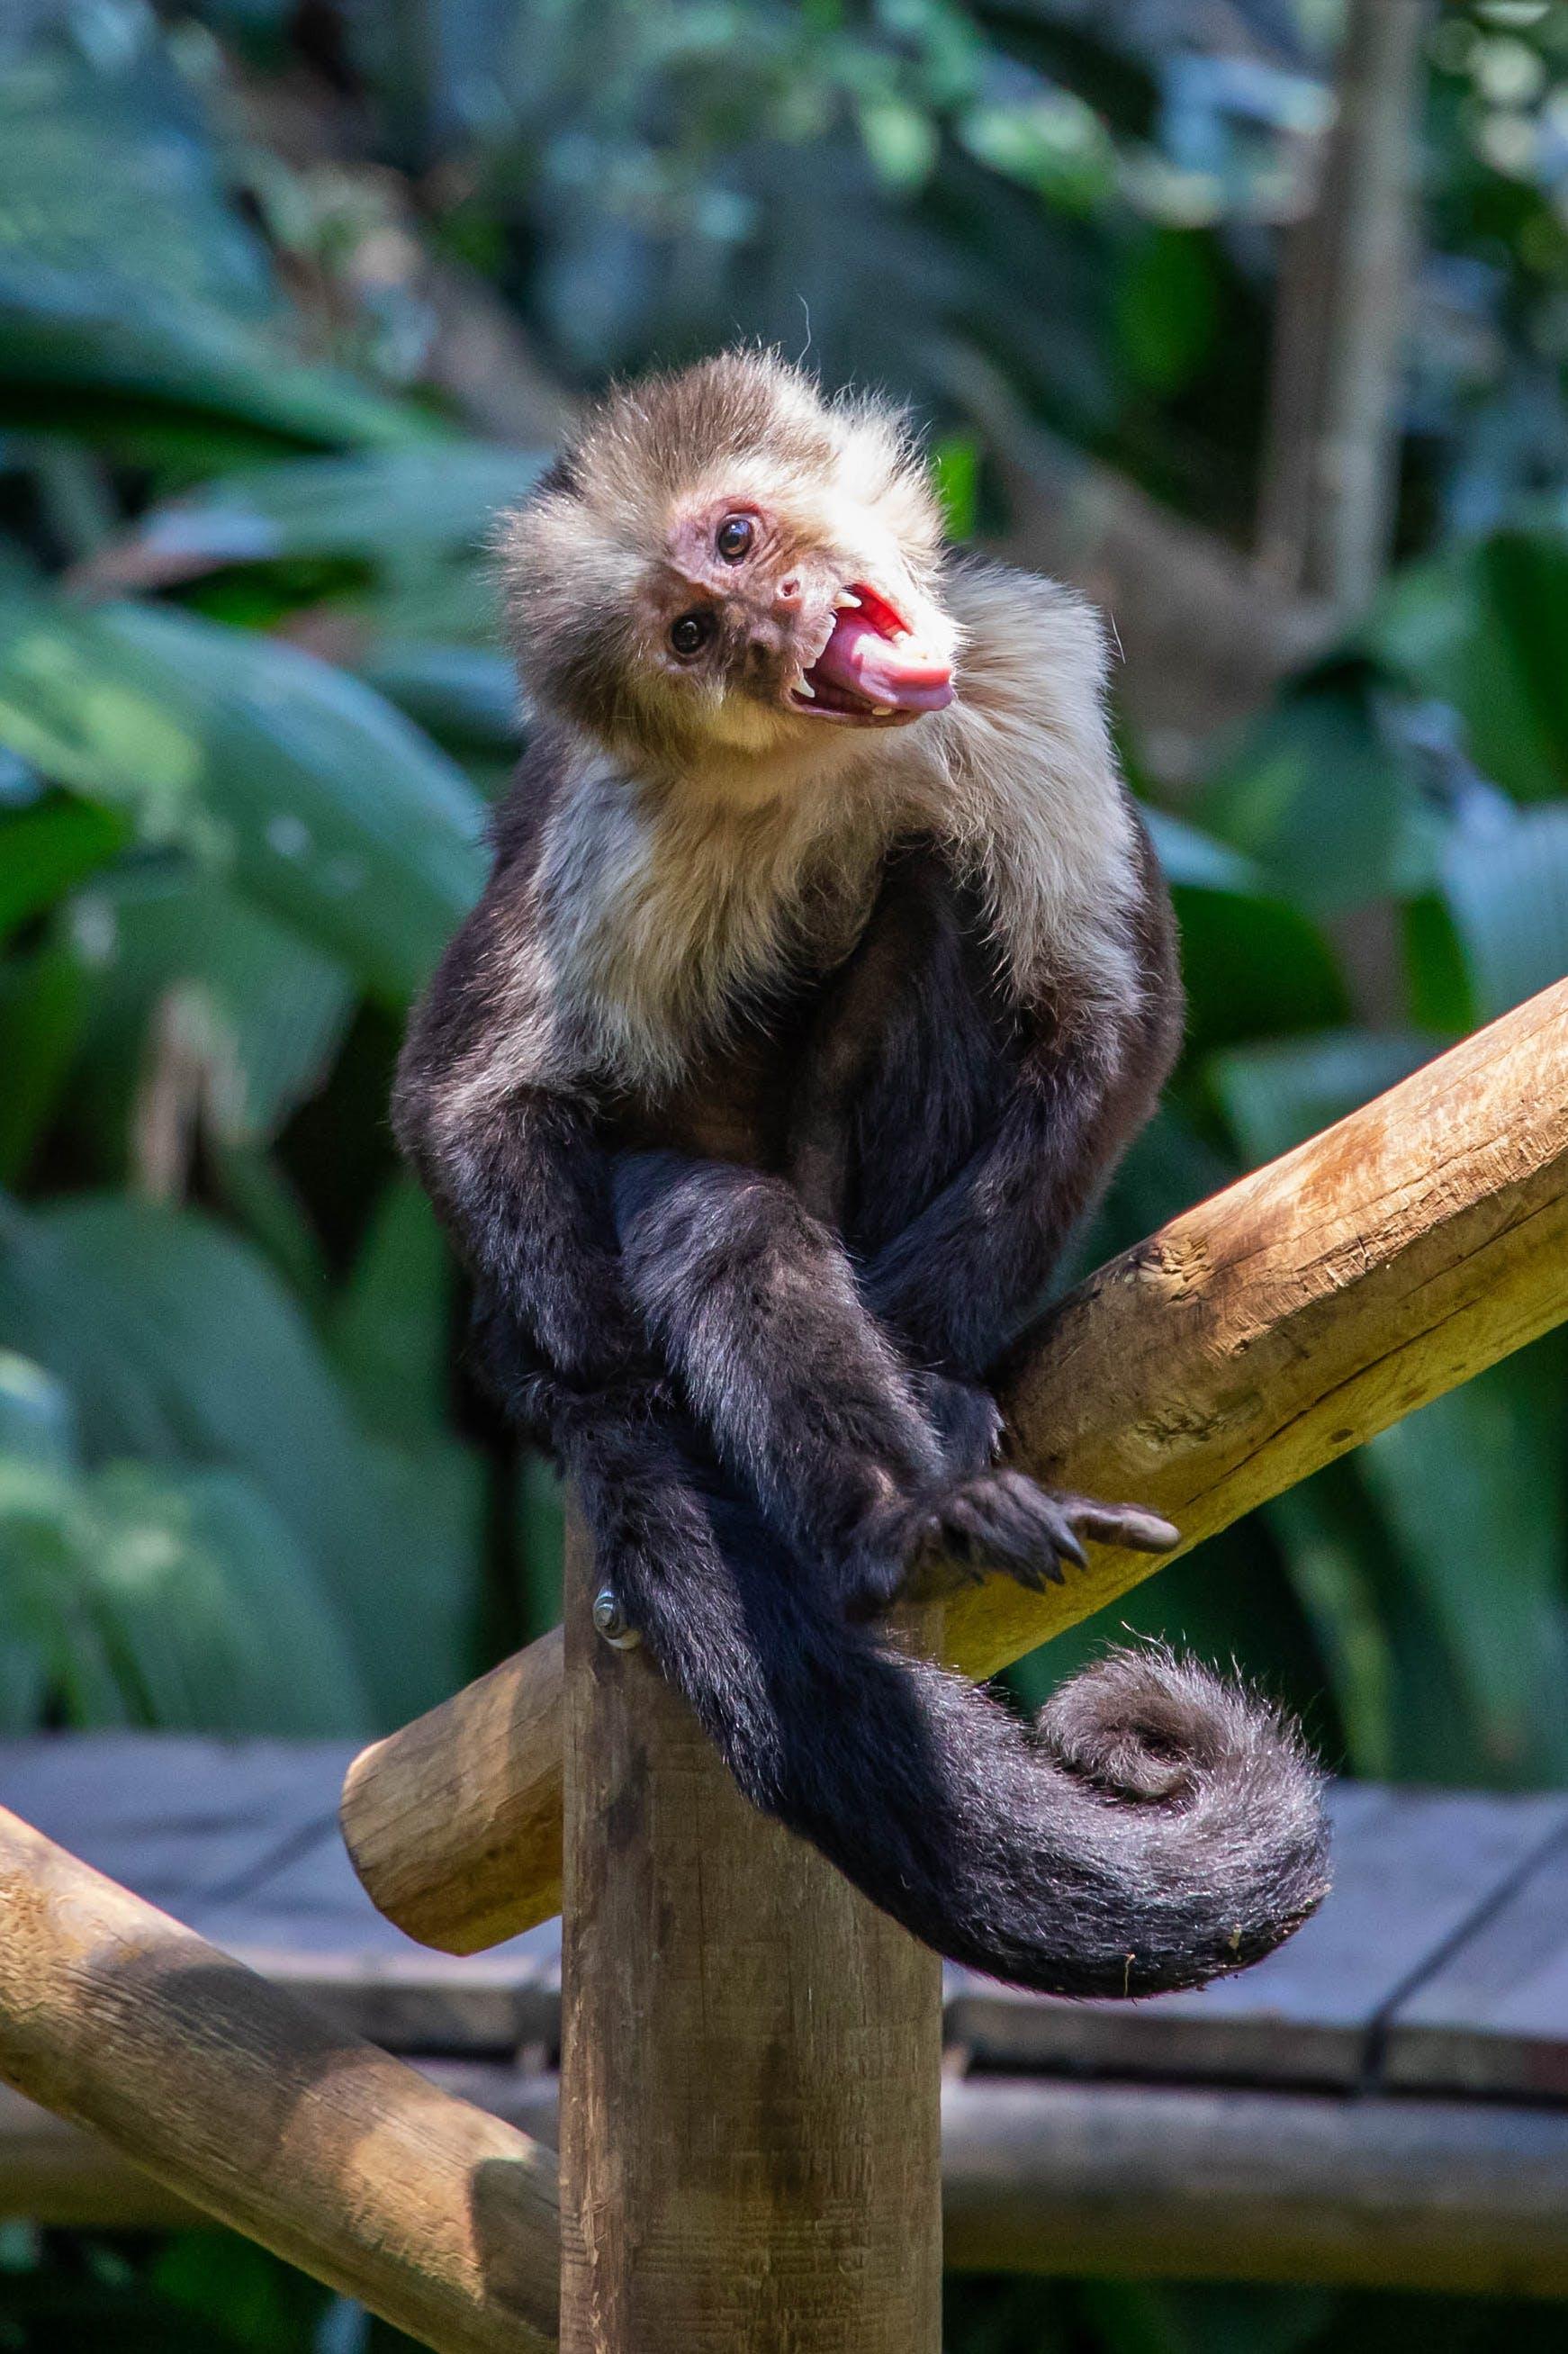 Free stock photo of monkey, nature life, wild animal, wild life